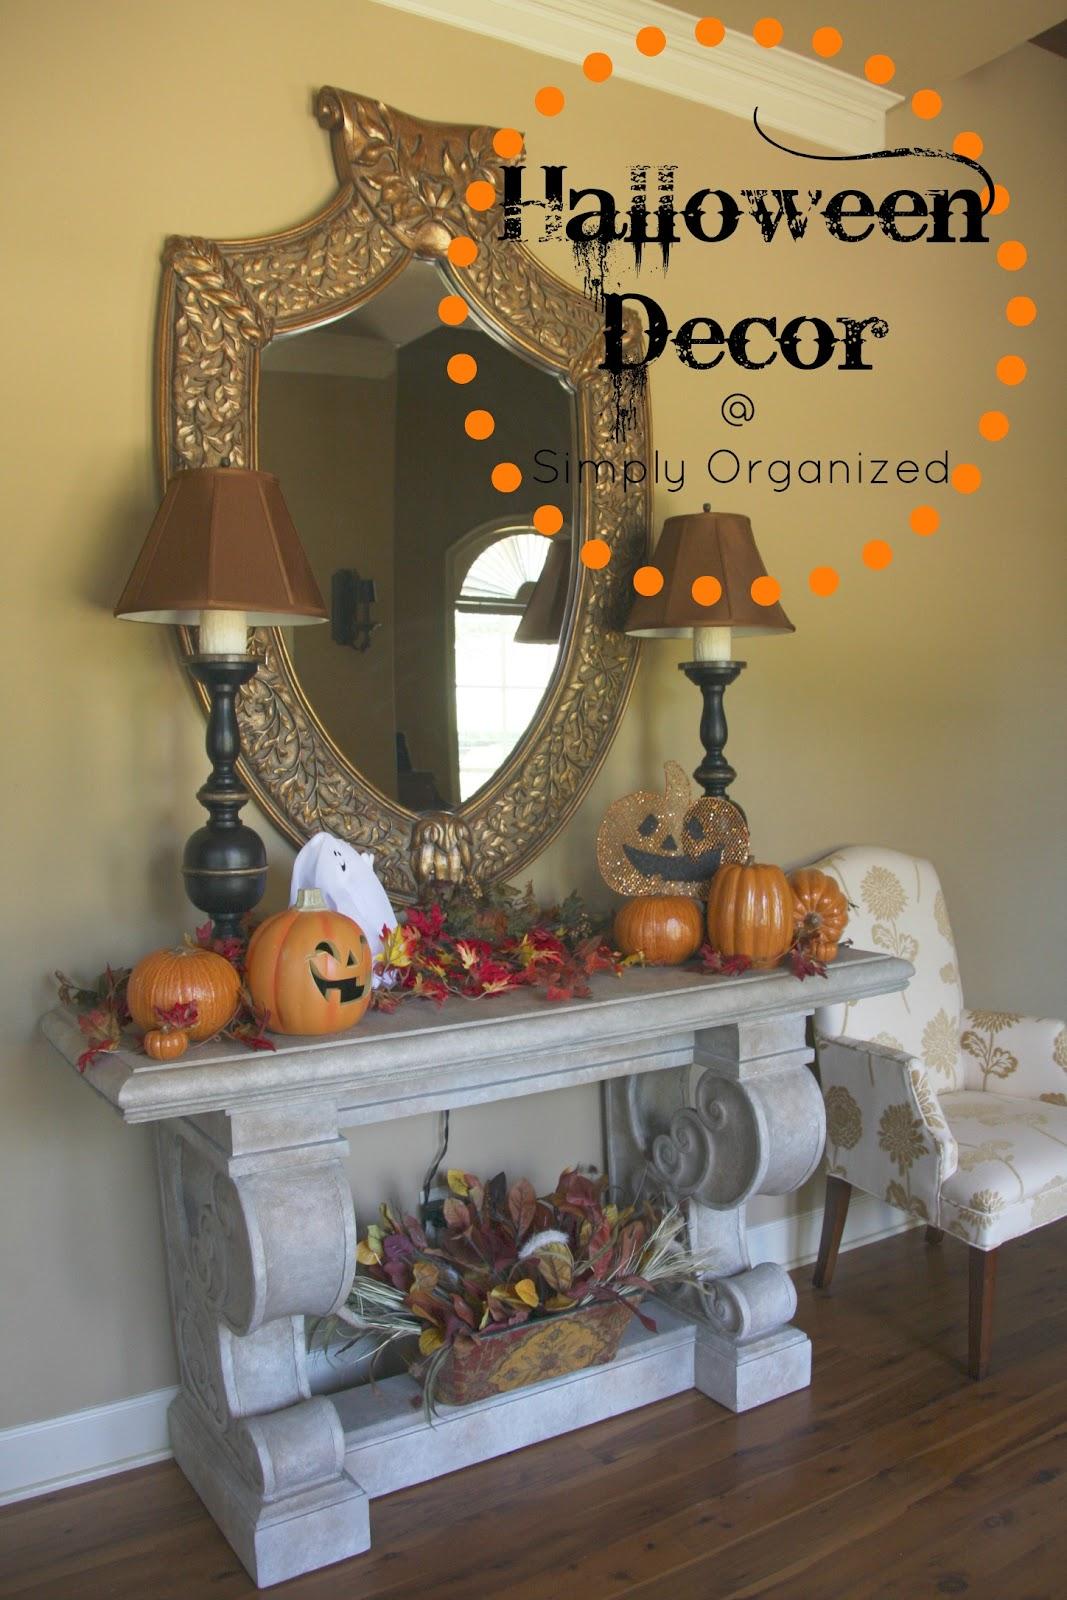 Simply Organized: Halloween Decor